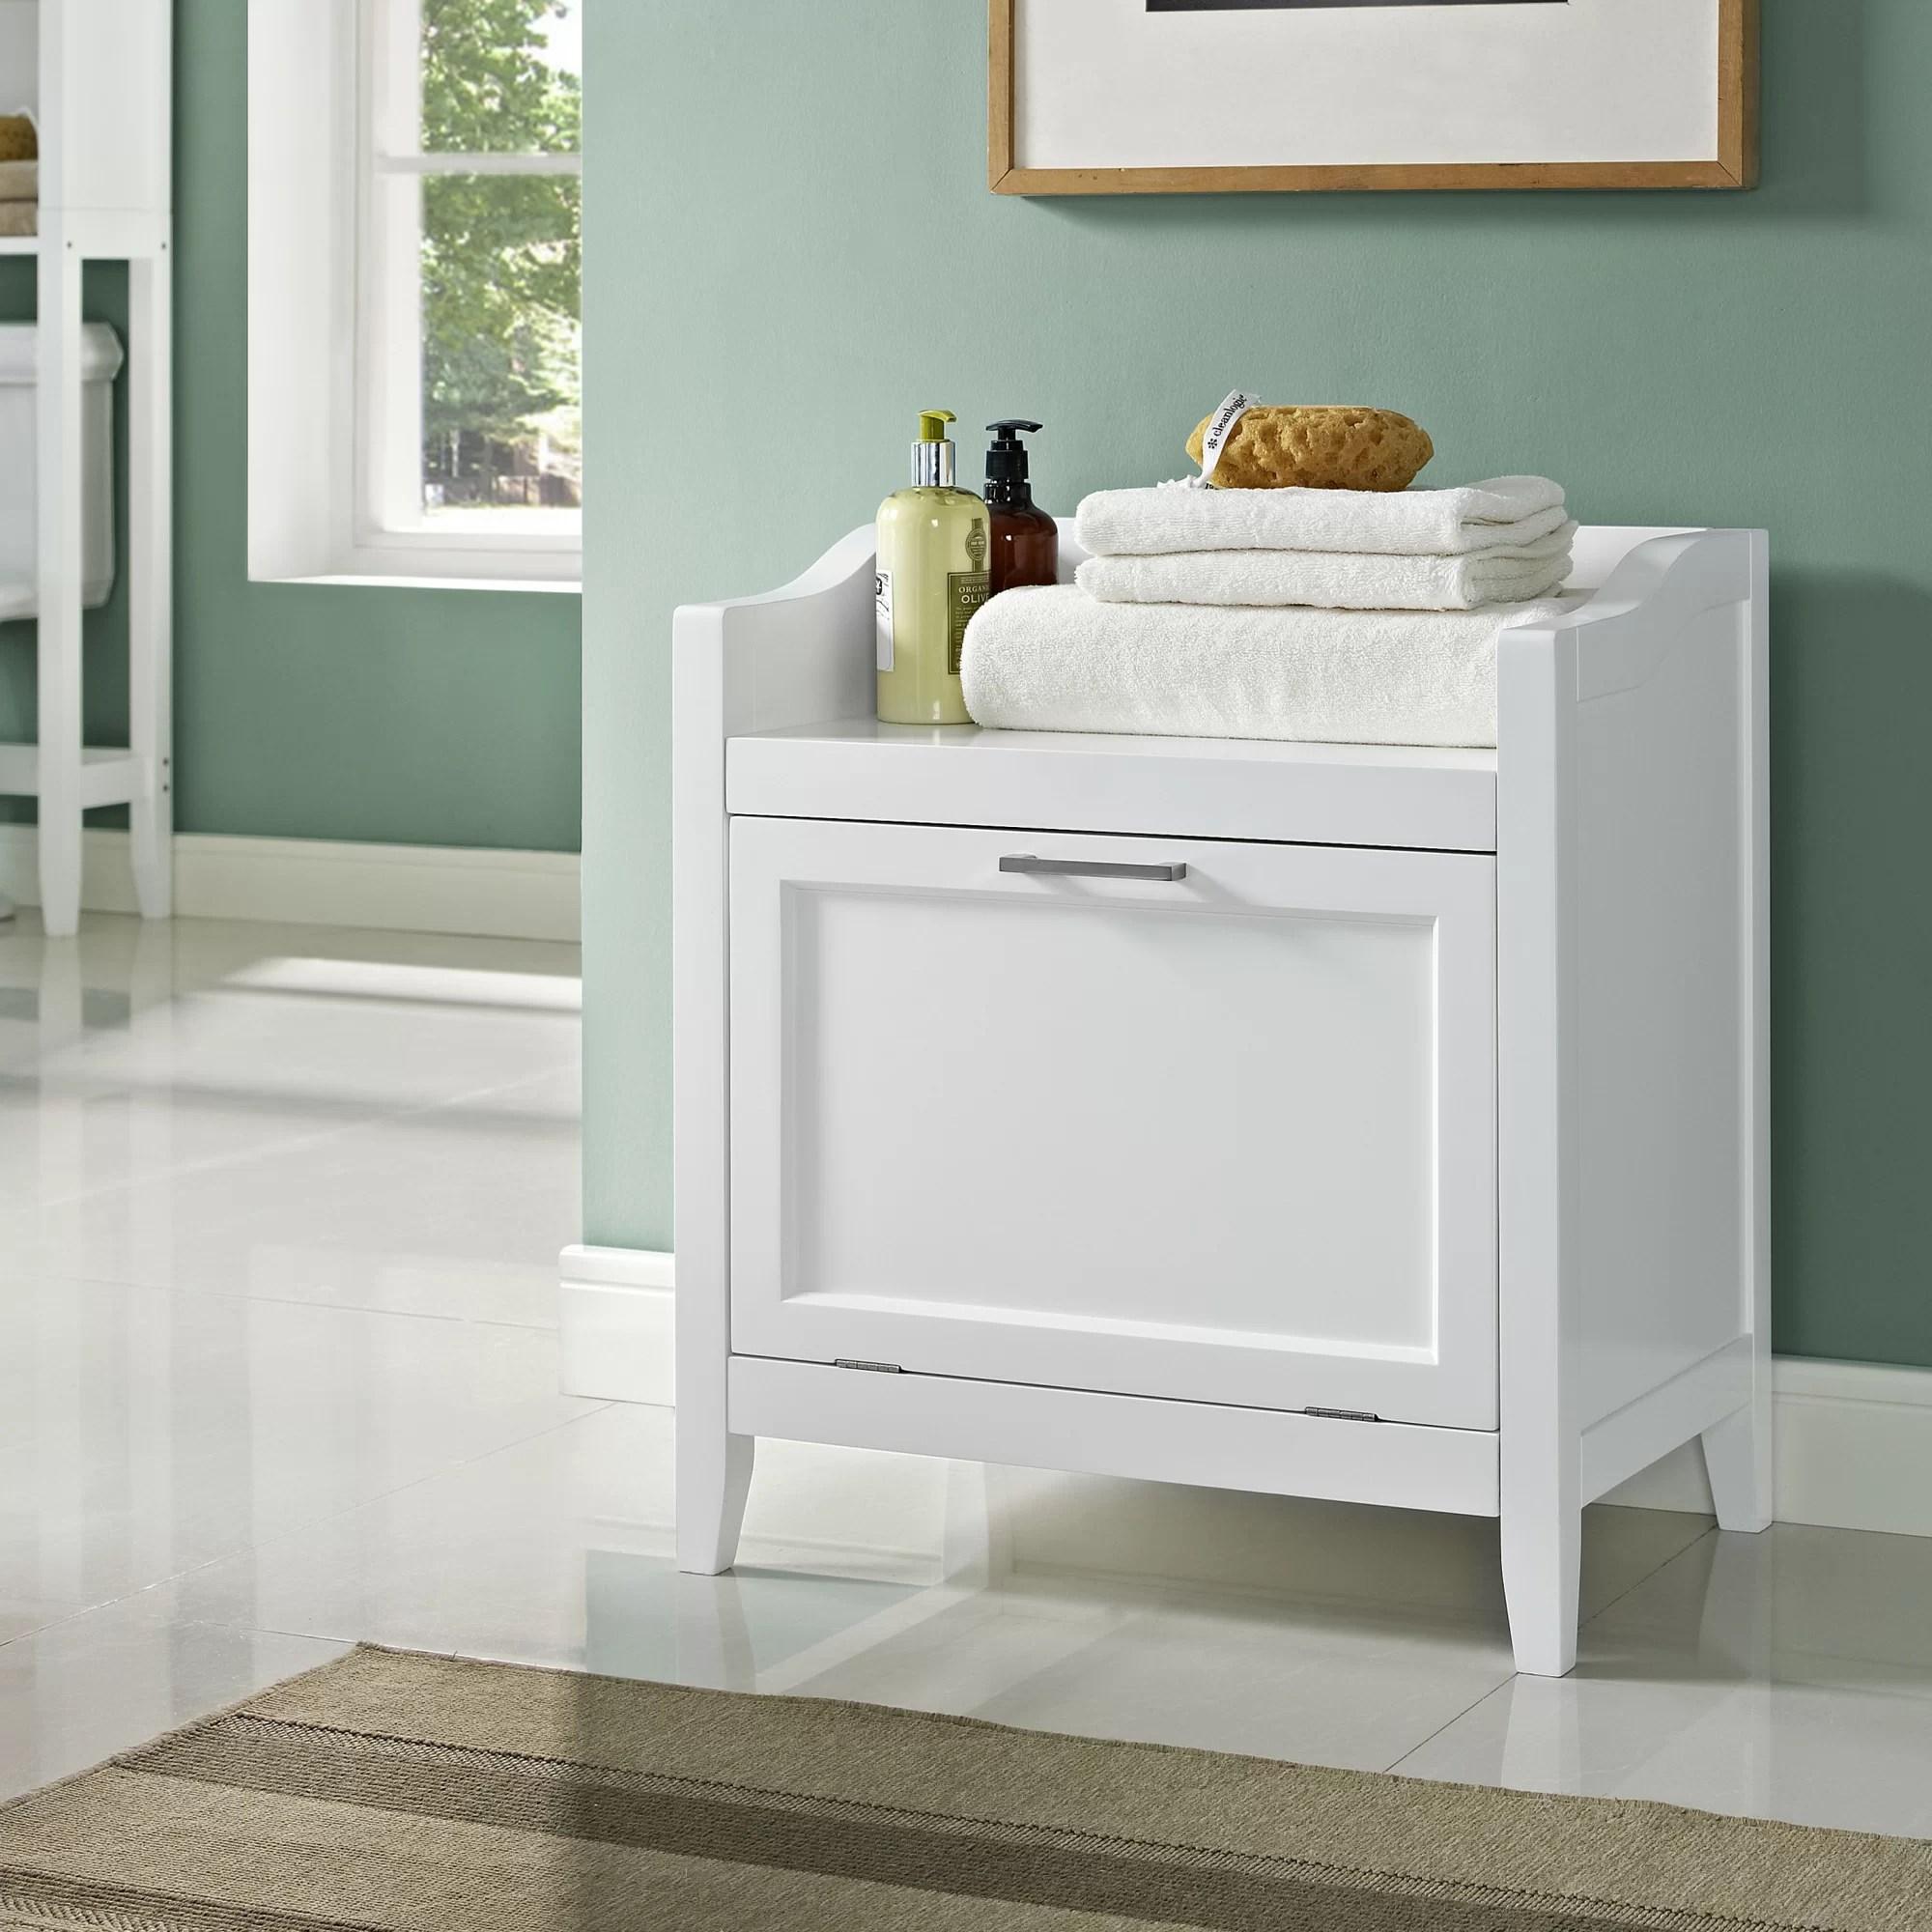 Simpli Home Avington Storage Cabinet Laundry Hamper  eBay